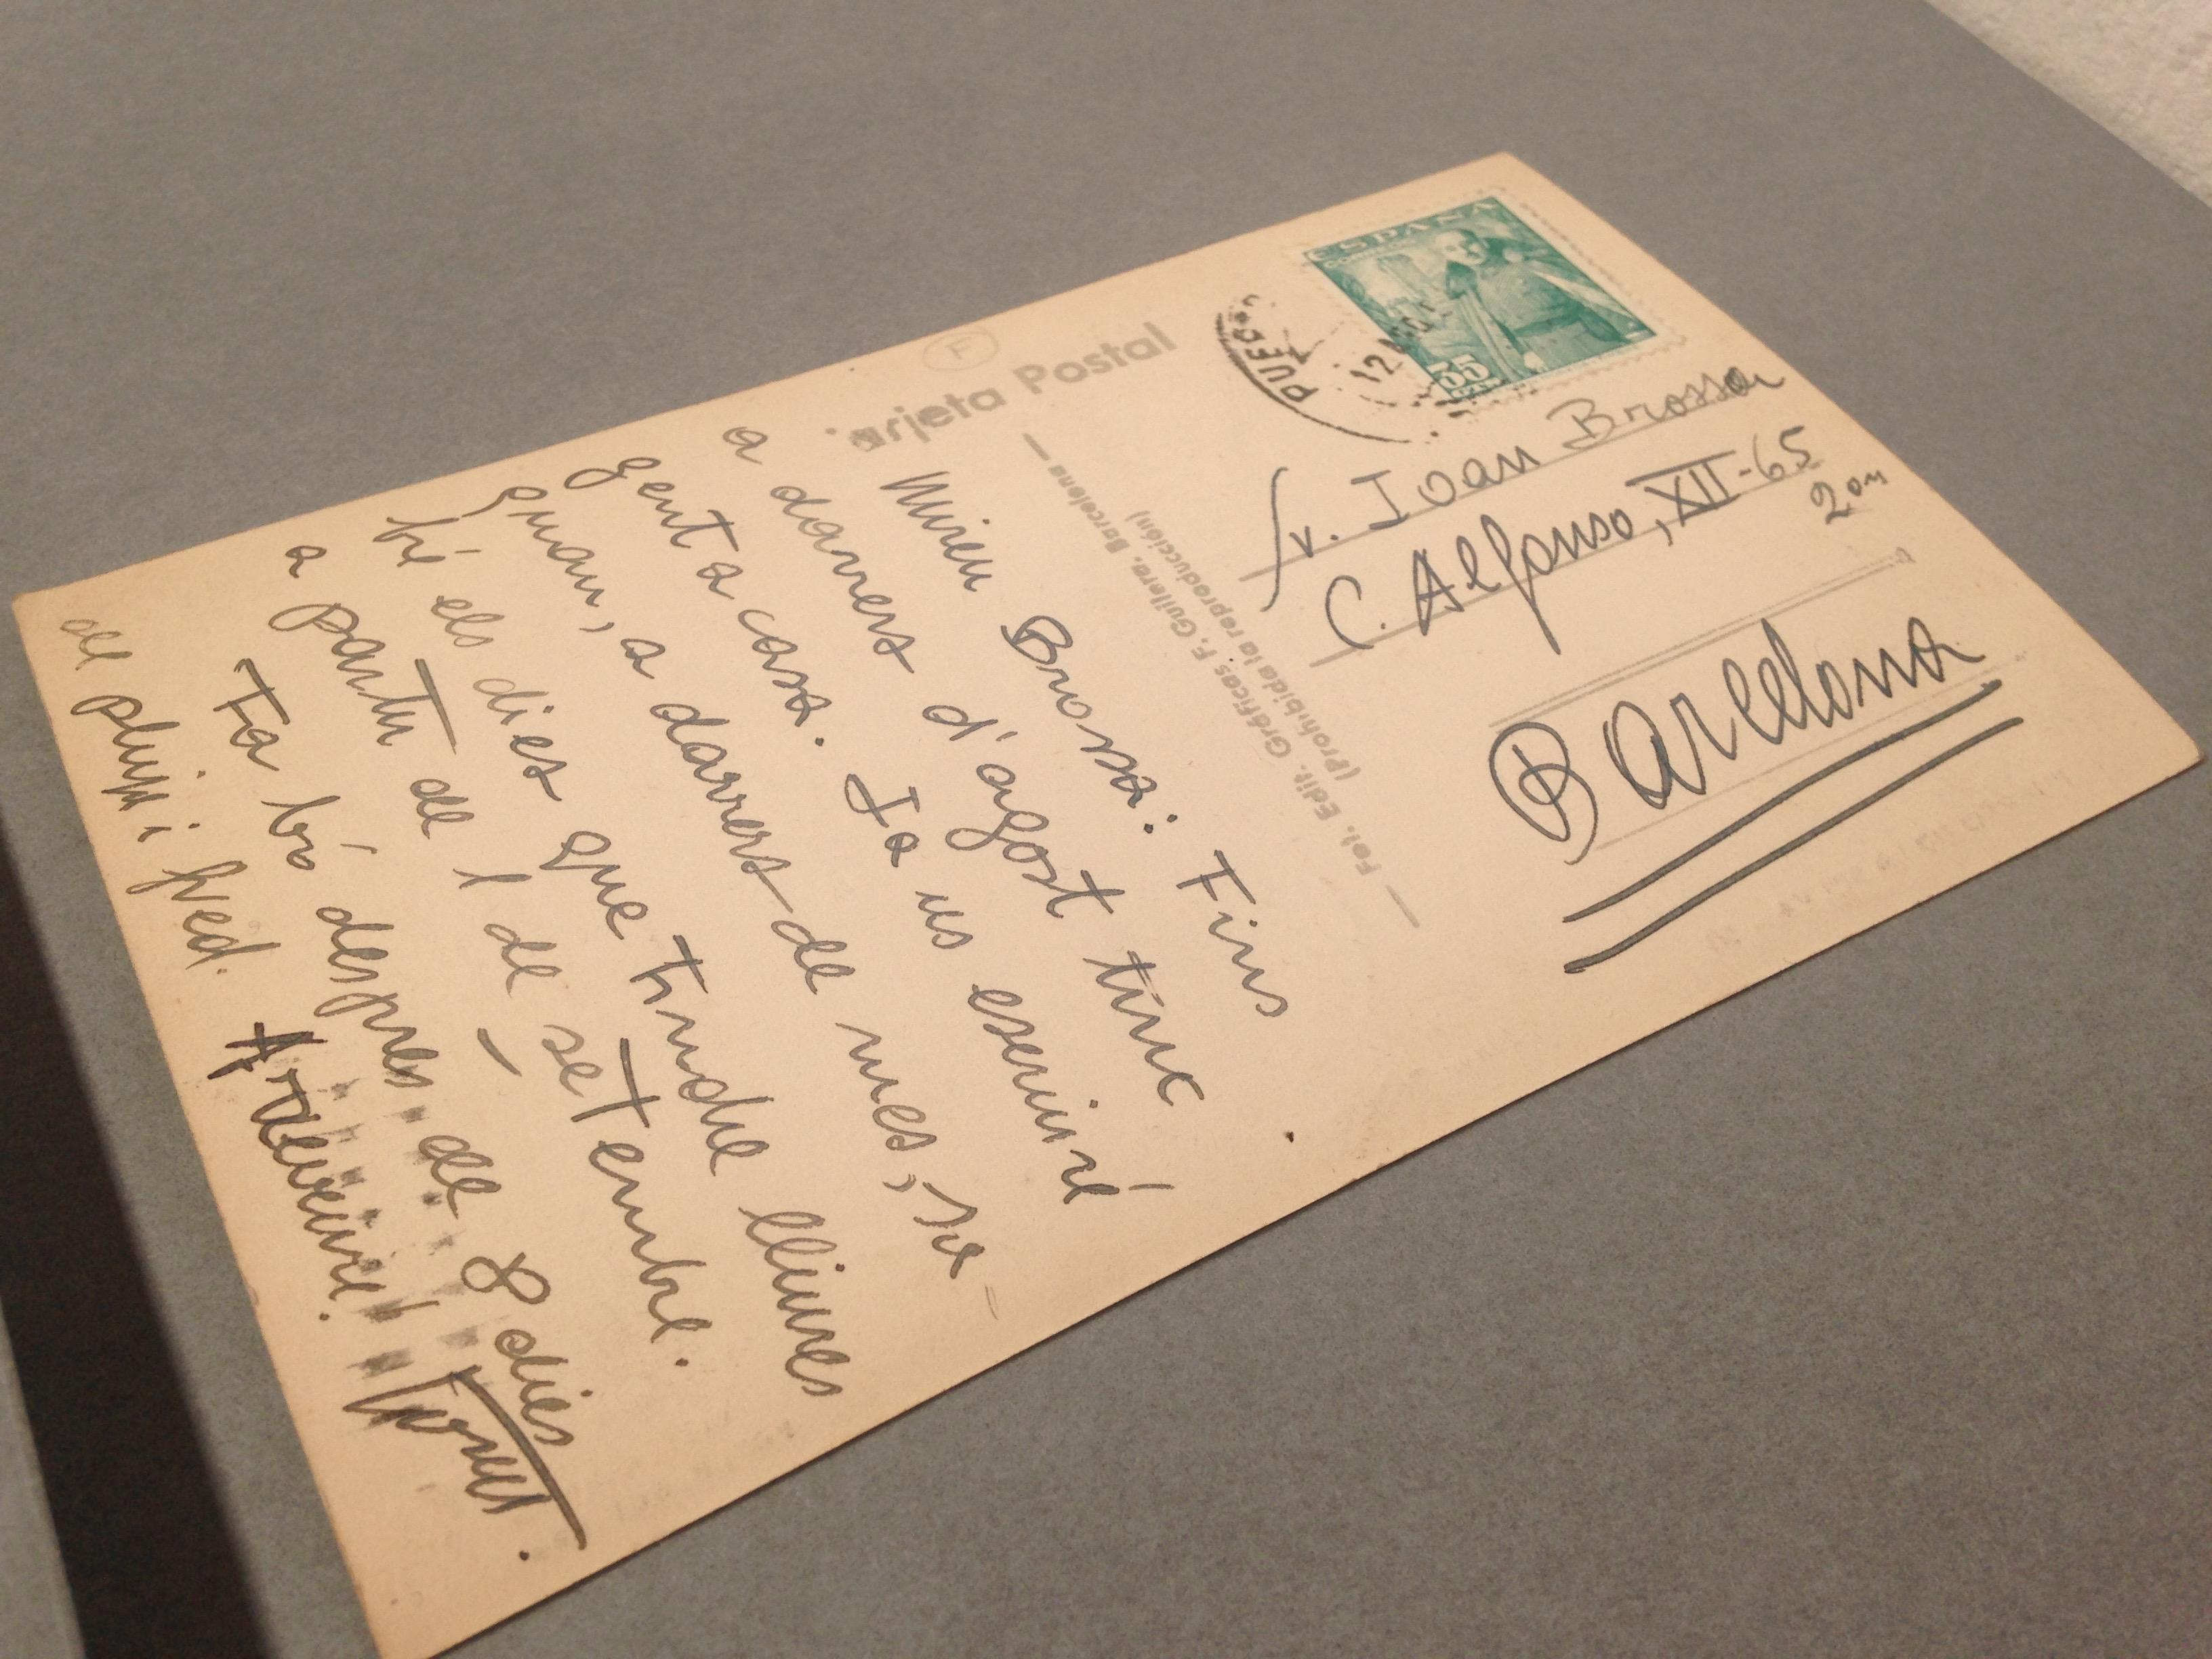 Detall del fons documenta de Joan Brossa.